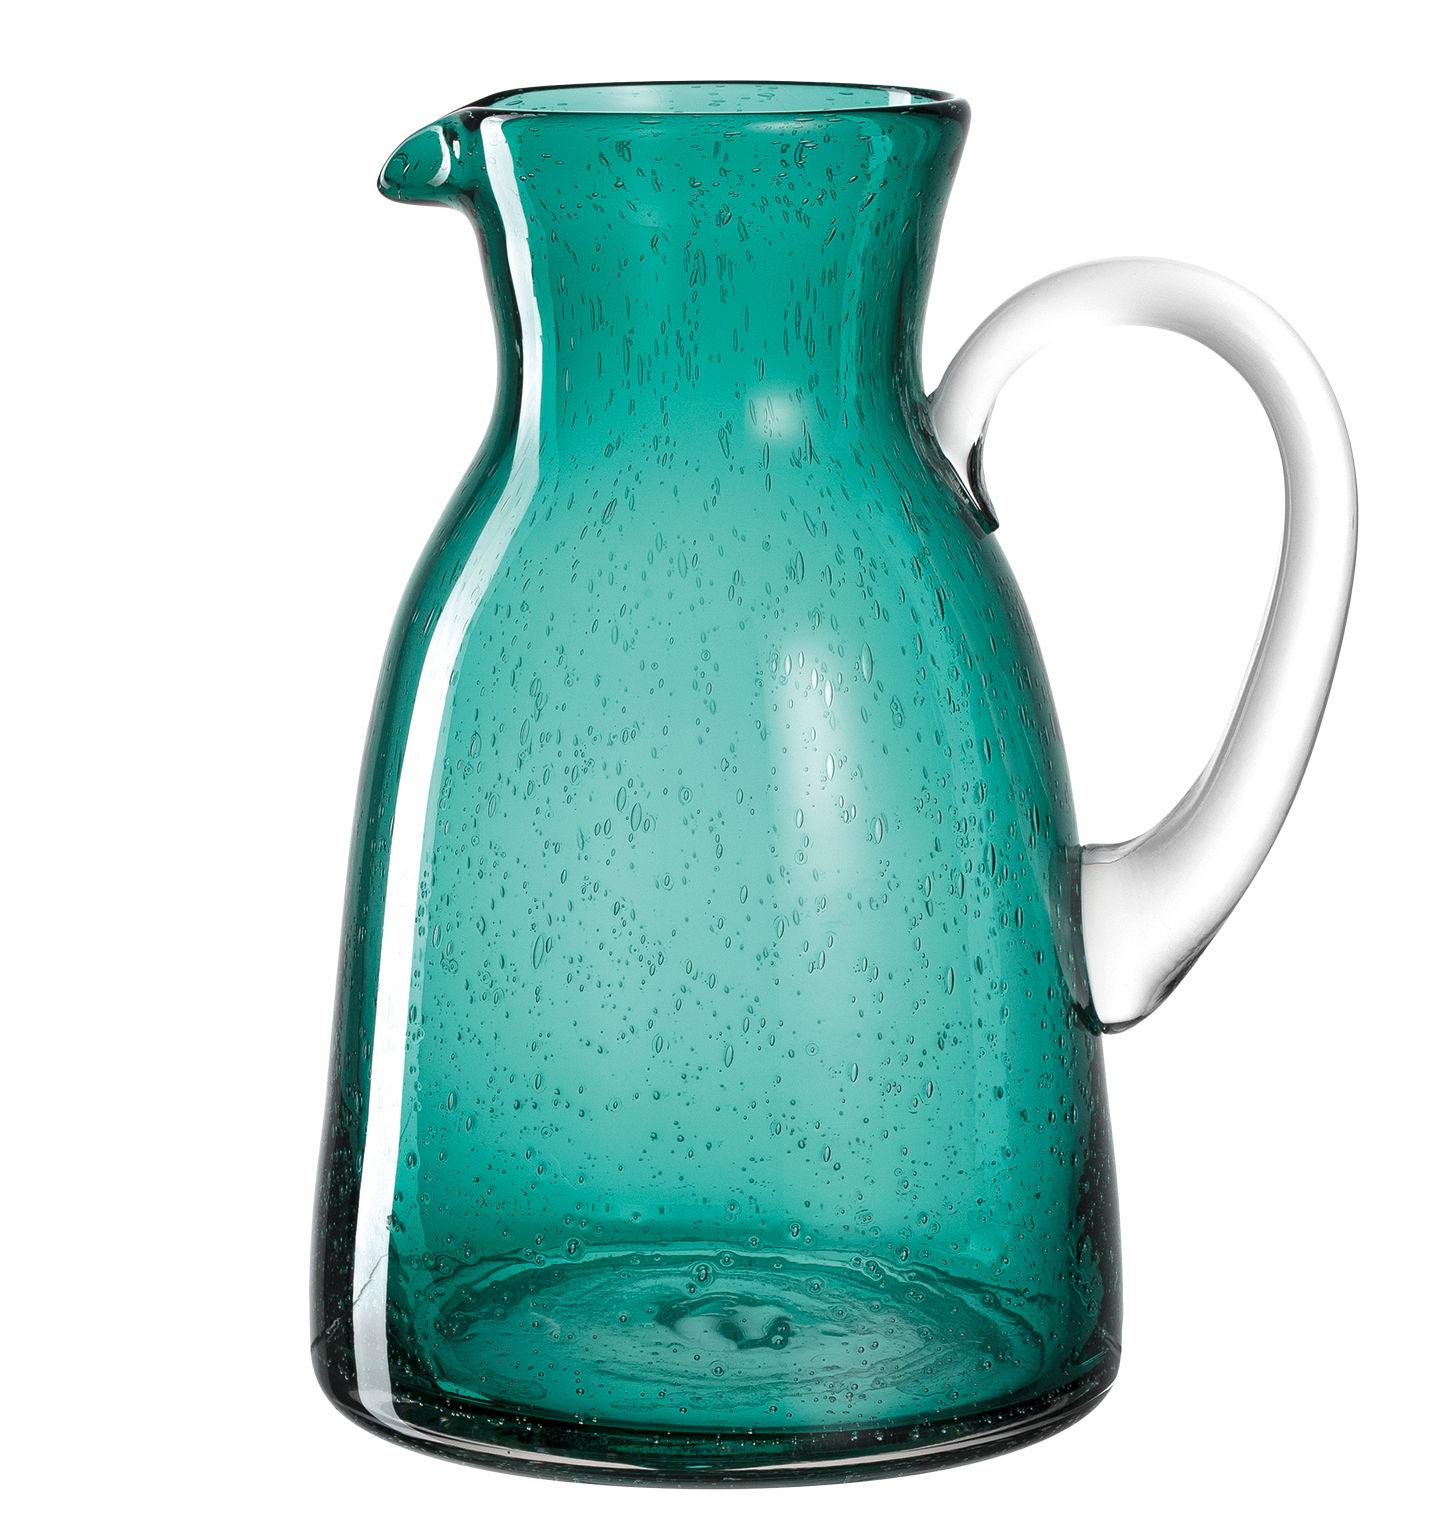 Tableware - Water Carafes & Wine Decanters - Burano Carafe - / 1,7 L - Fait main by Leonardo - Bleu vert lagune - Bubbled glass